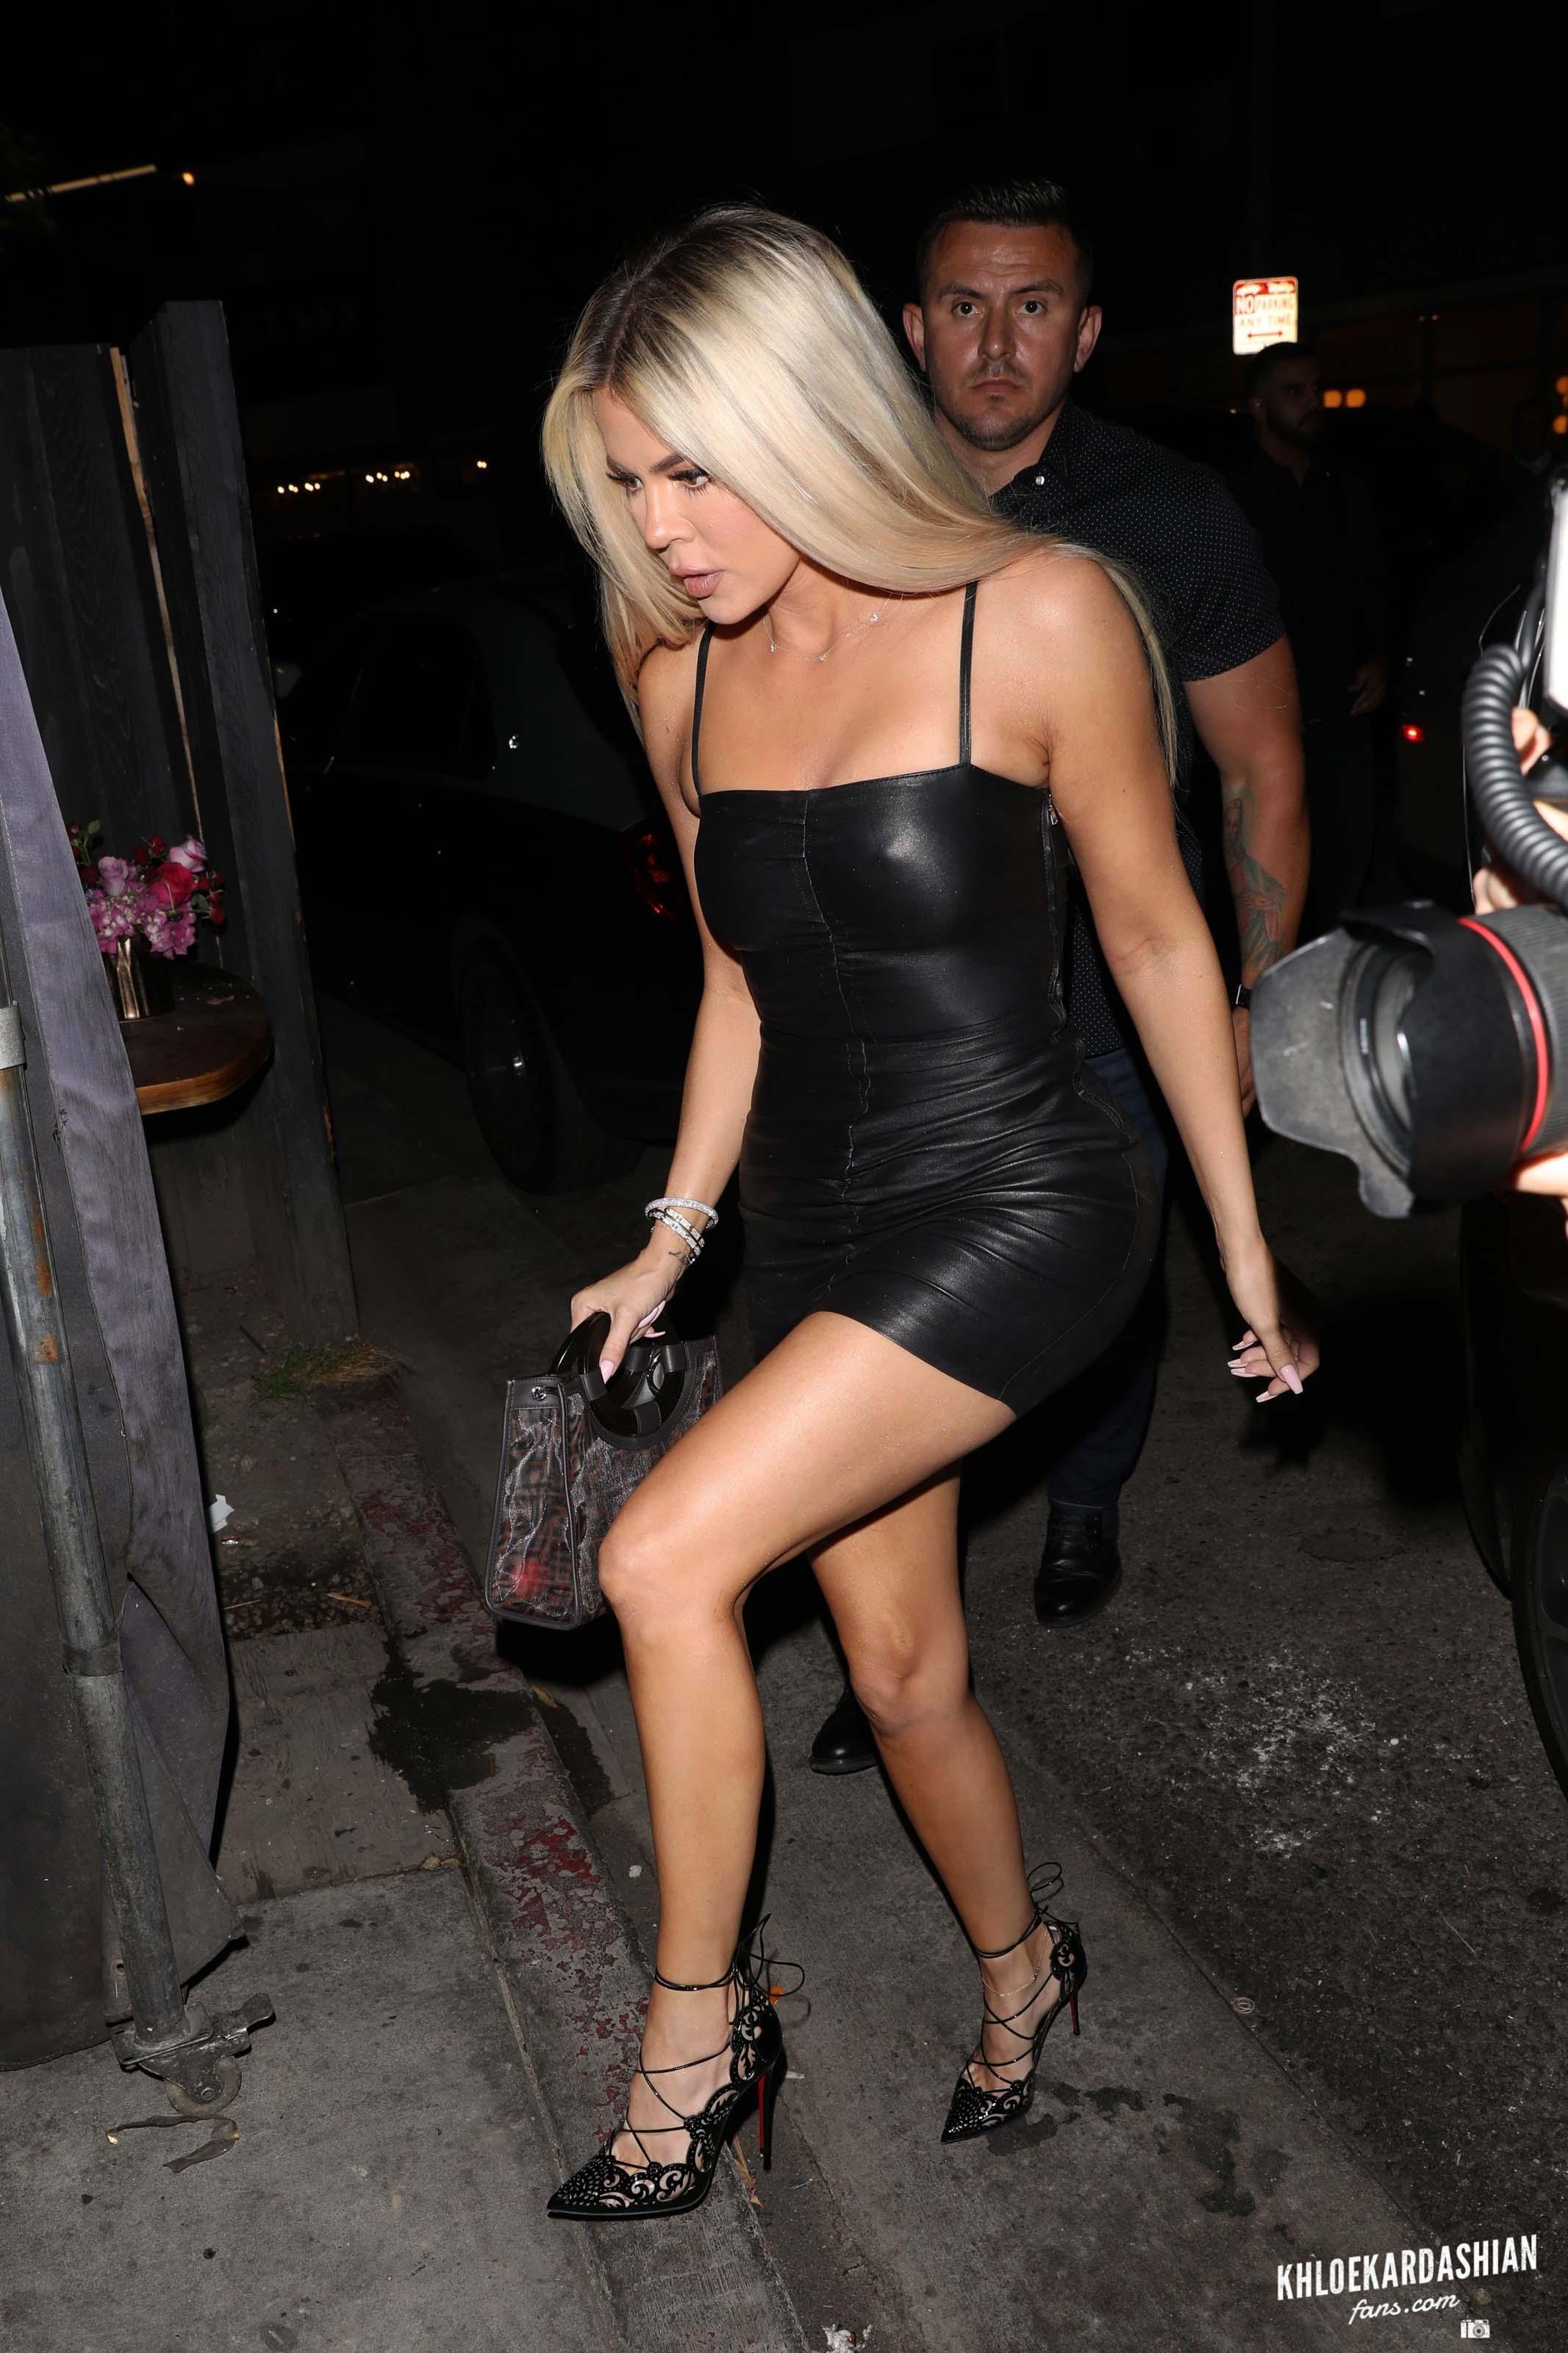 Khloe Kardashian arriving at Nice Guy restaurant